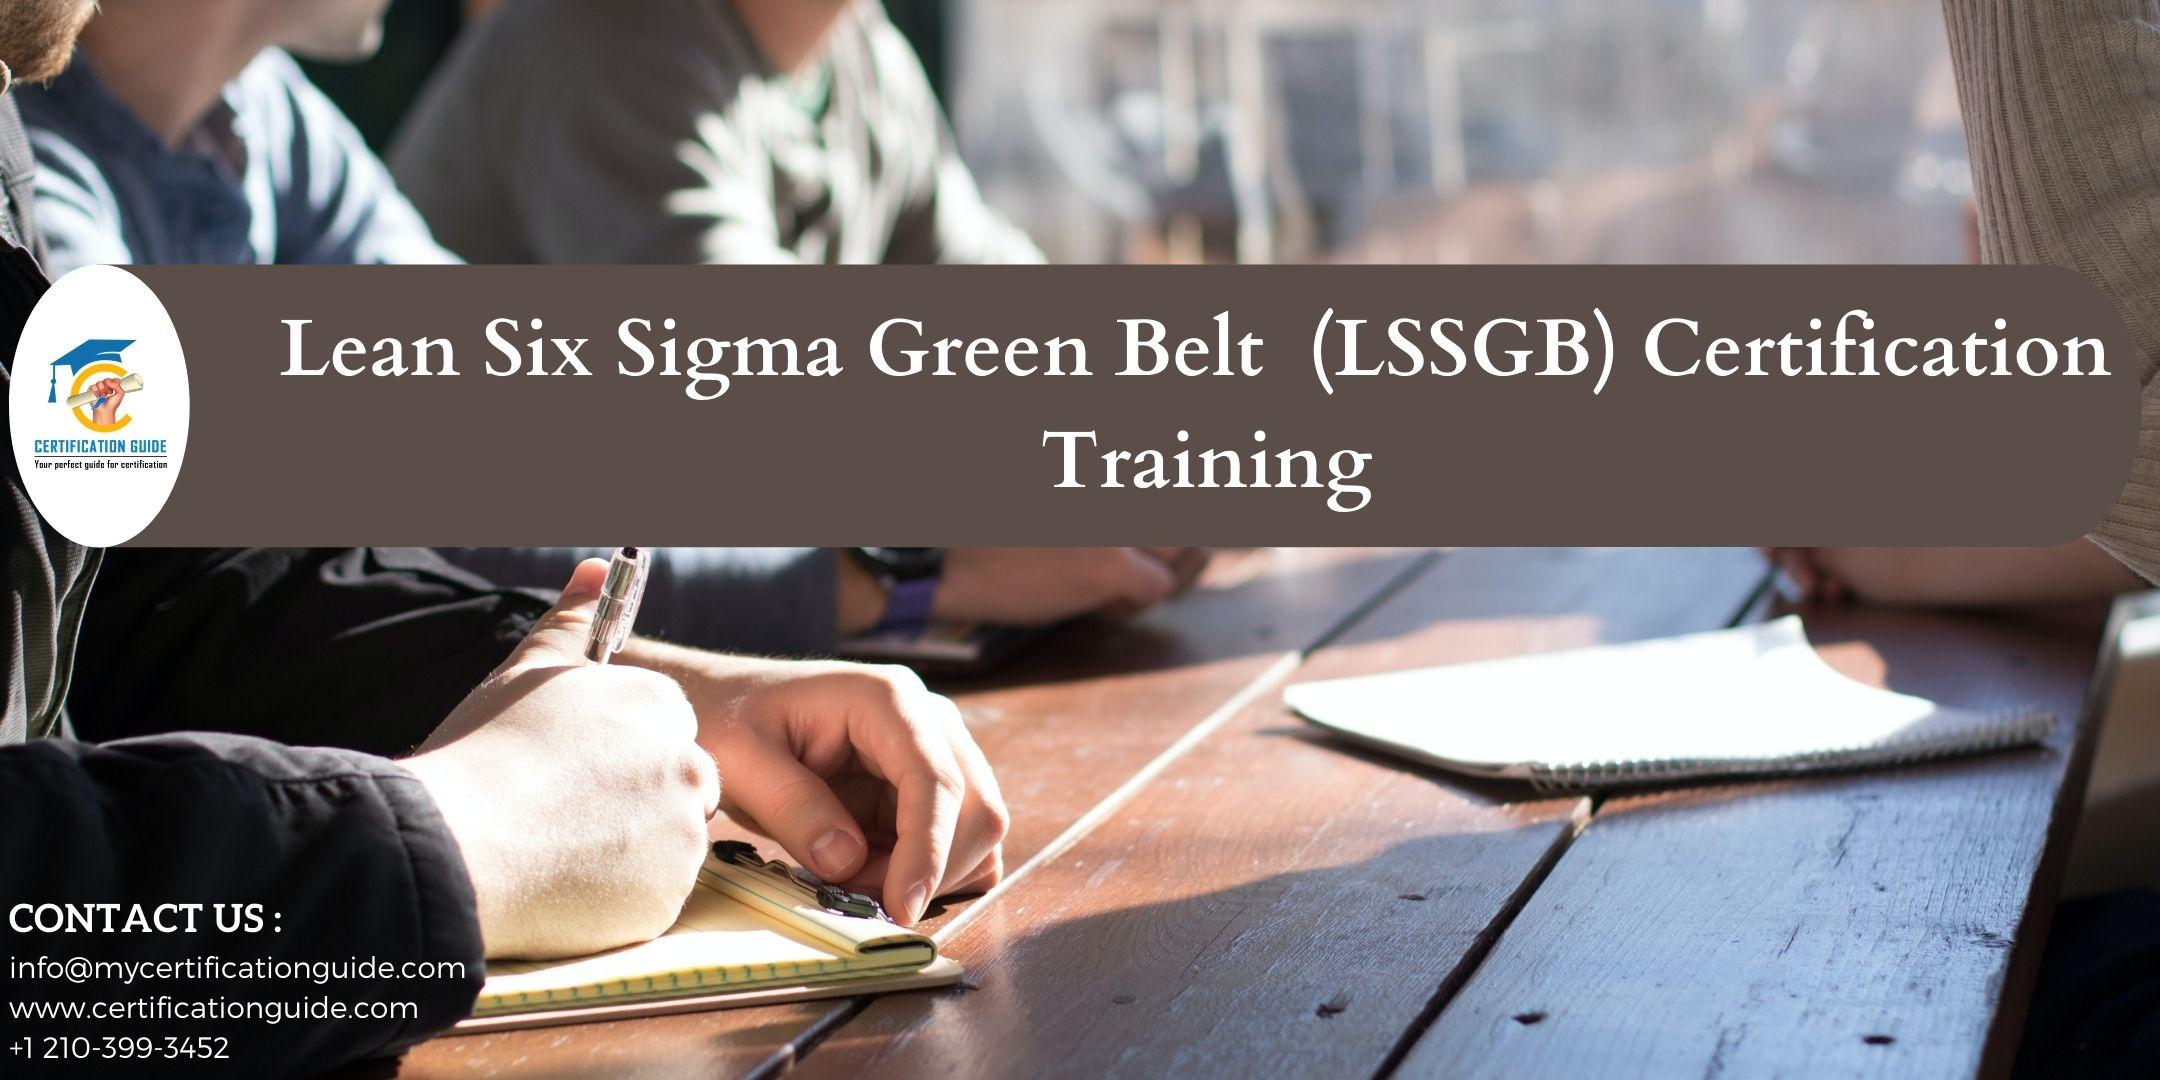 Lean Six Sigma Green Belt - LSSGB Certification Training in Auburn, AL